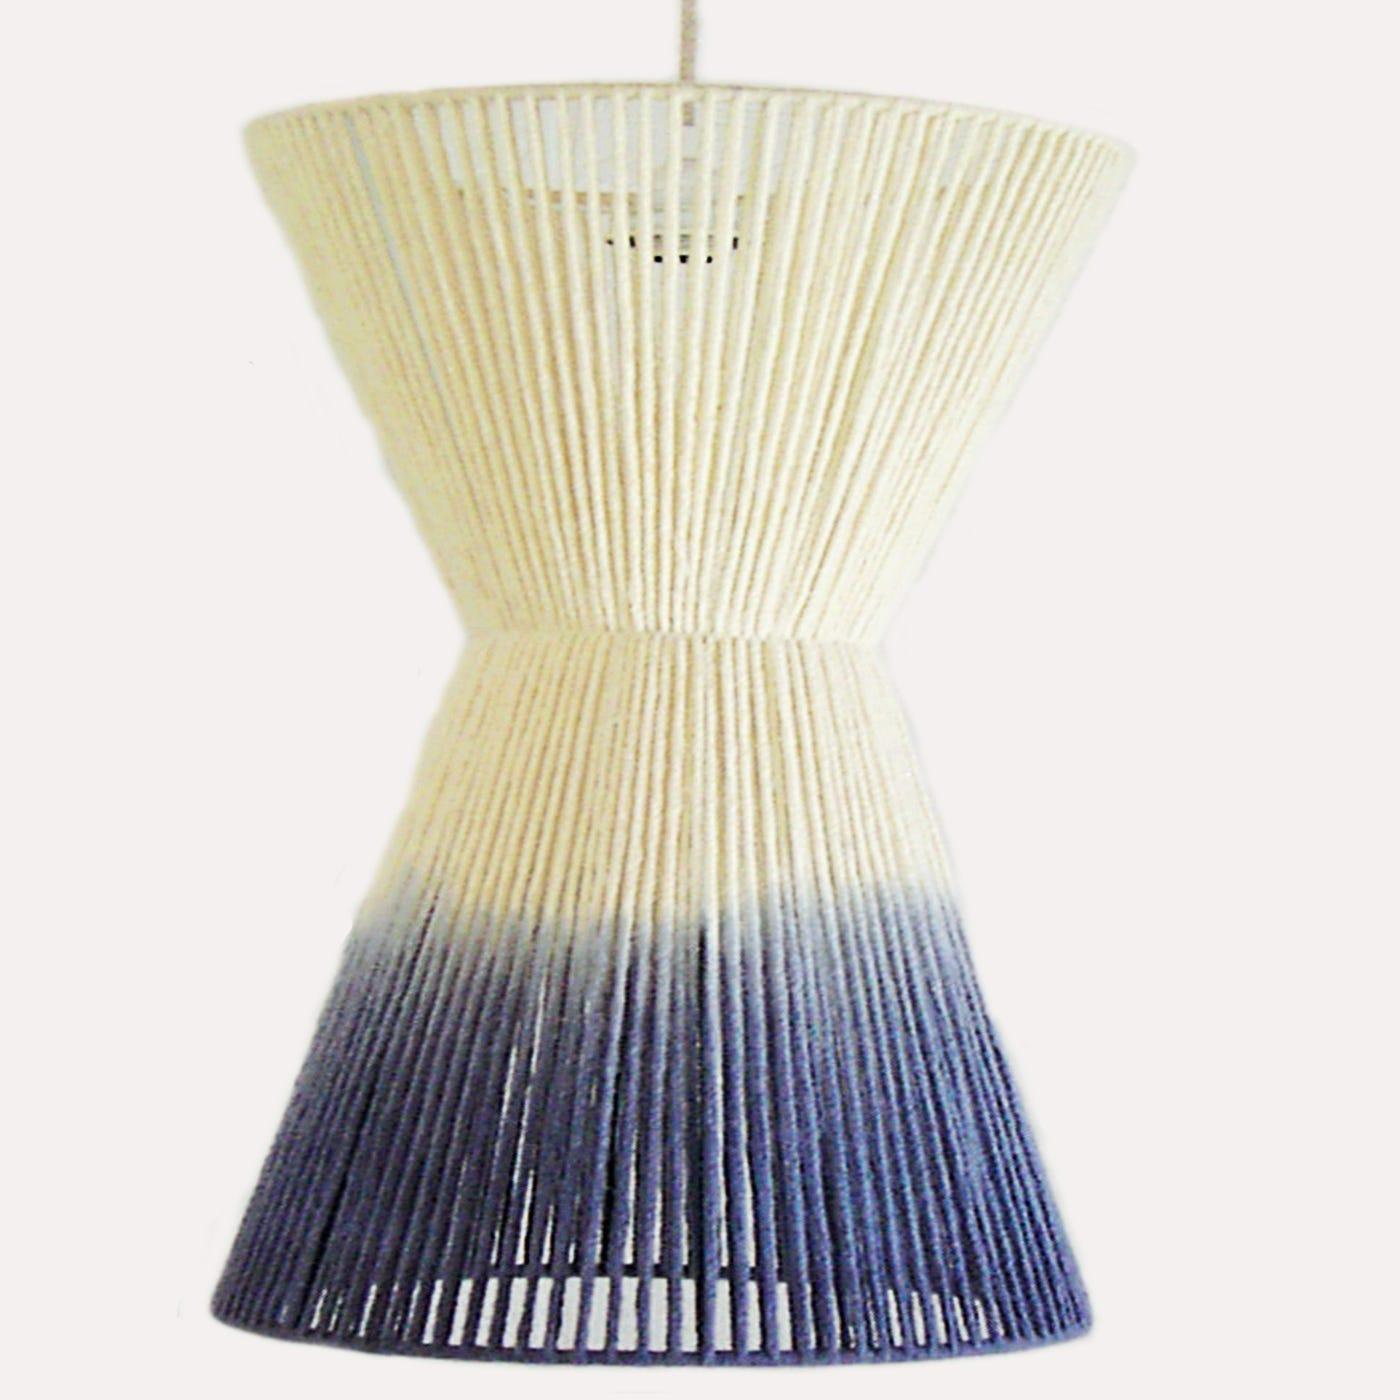 Nipped Pendant